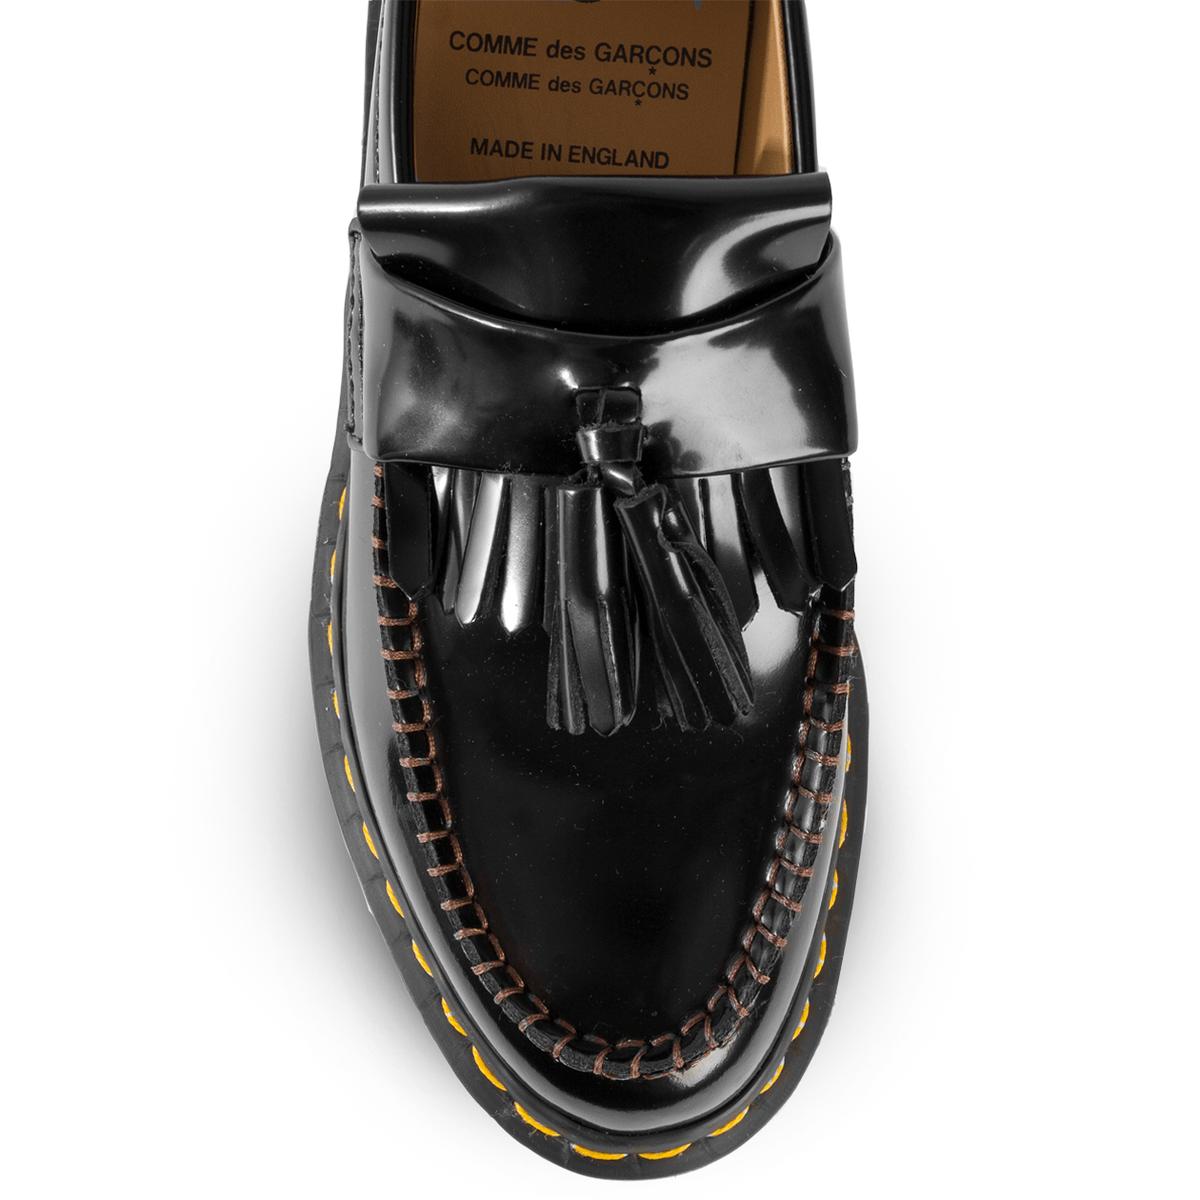 Comme Des Garçons Comme Des Garçons Dr Martens Adrian Tassel Loafer Shoes Hervia